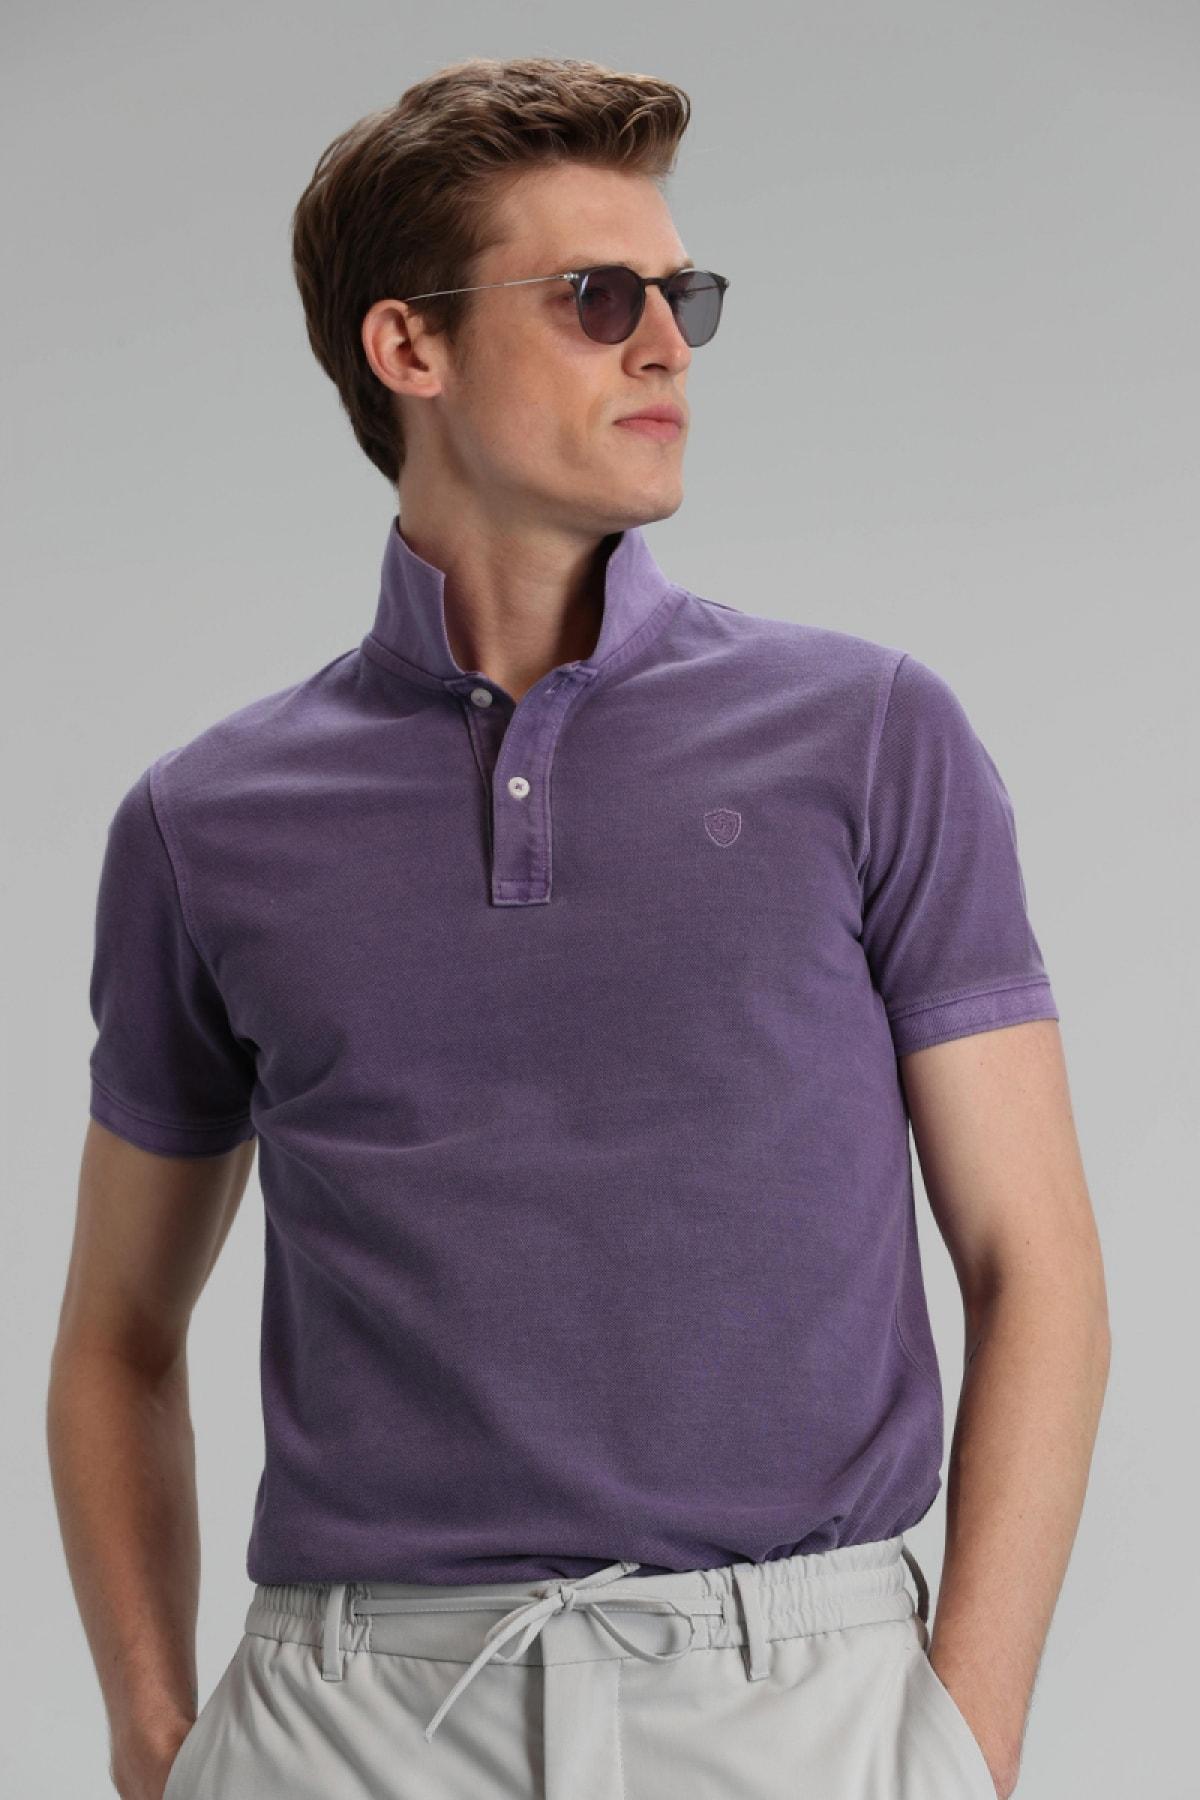 Lufian Erkek Spor Polo T- Shirt 1